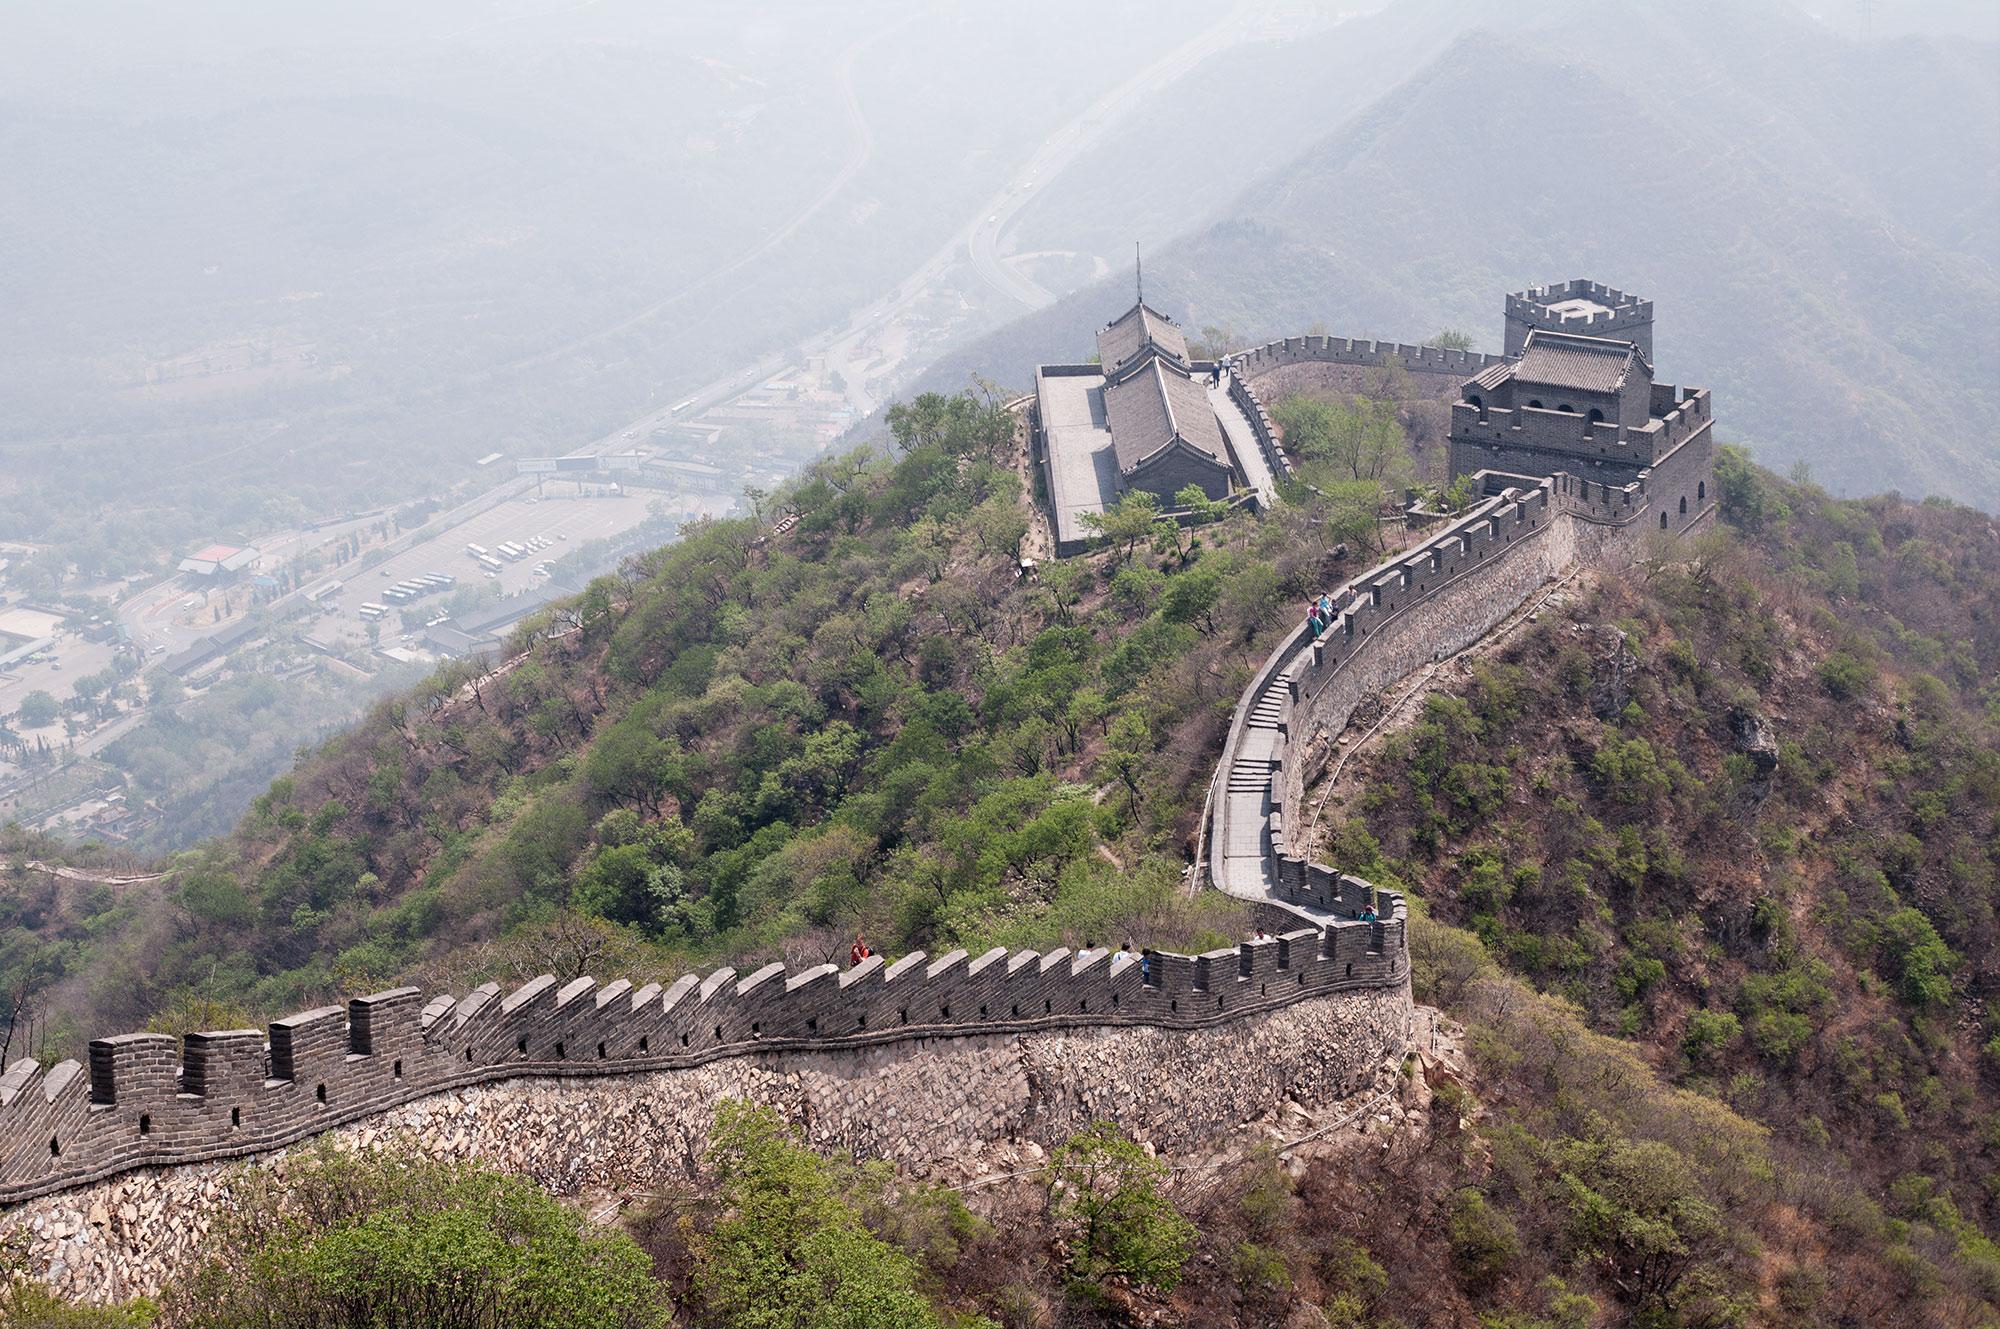 Der Blick zurück: Ausblick auf den Abschnitt der chinesischen Mauer bei Juyongguan